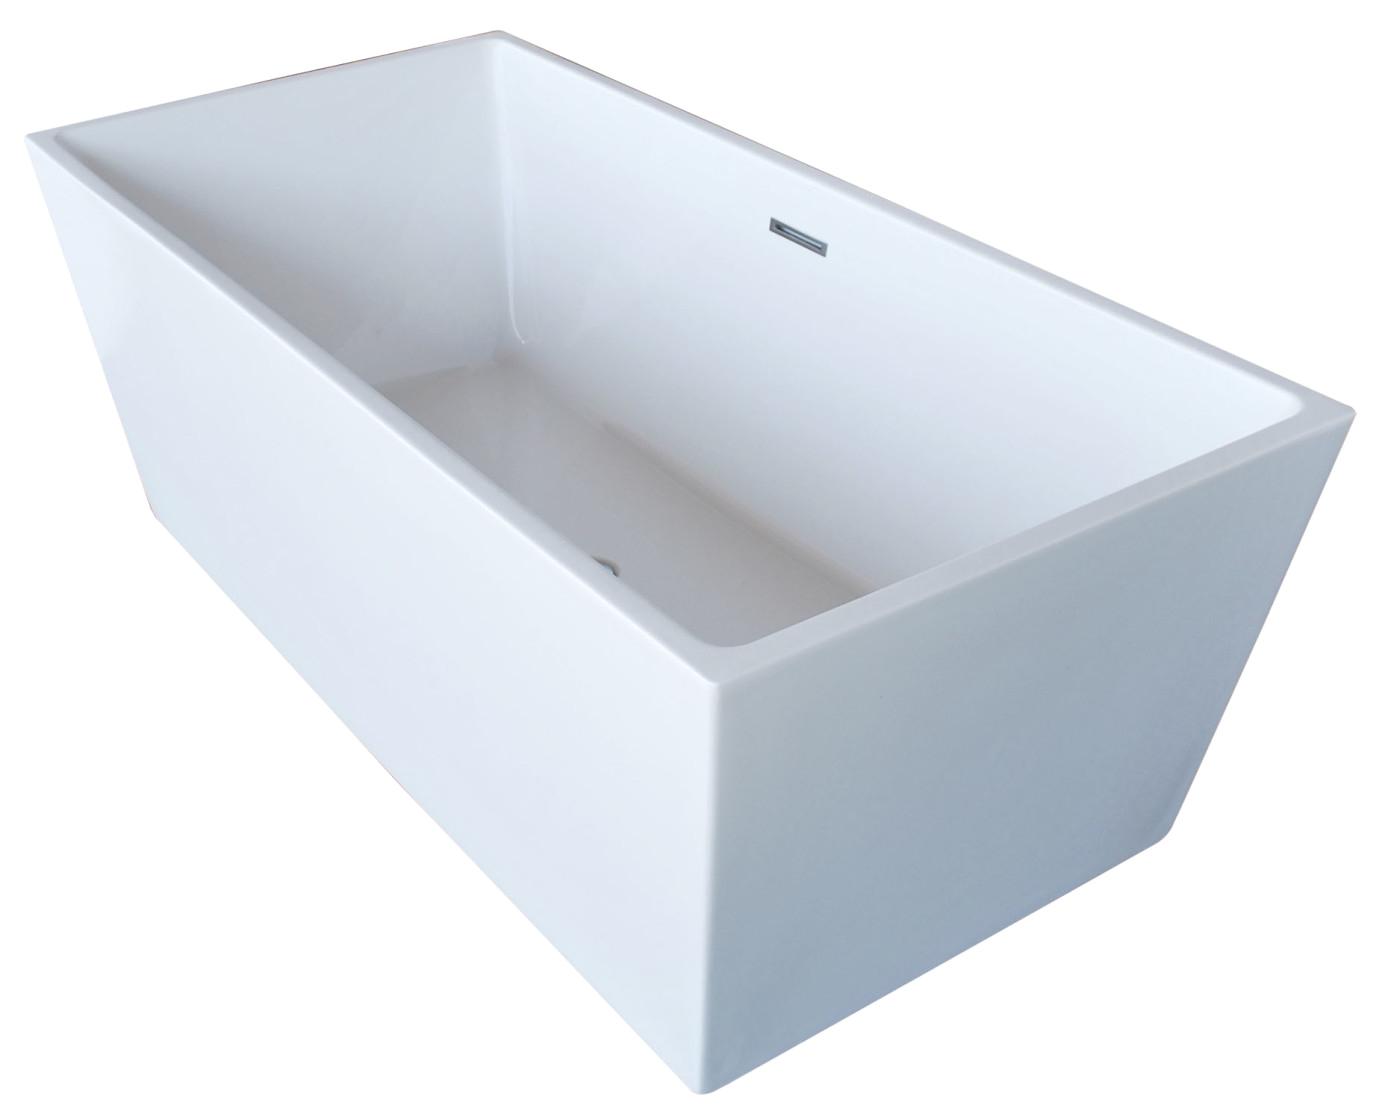 fjord 5 6 ft acrylic center drain freestanding bathtub in glossy white